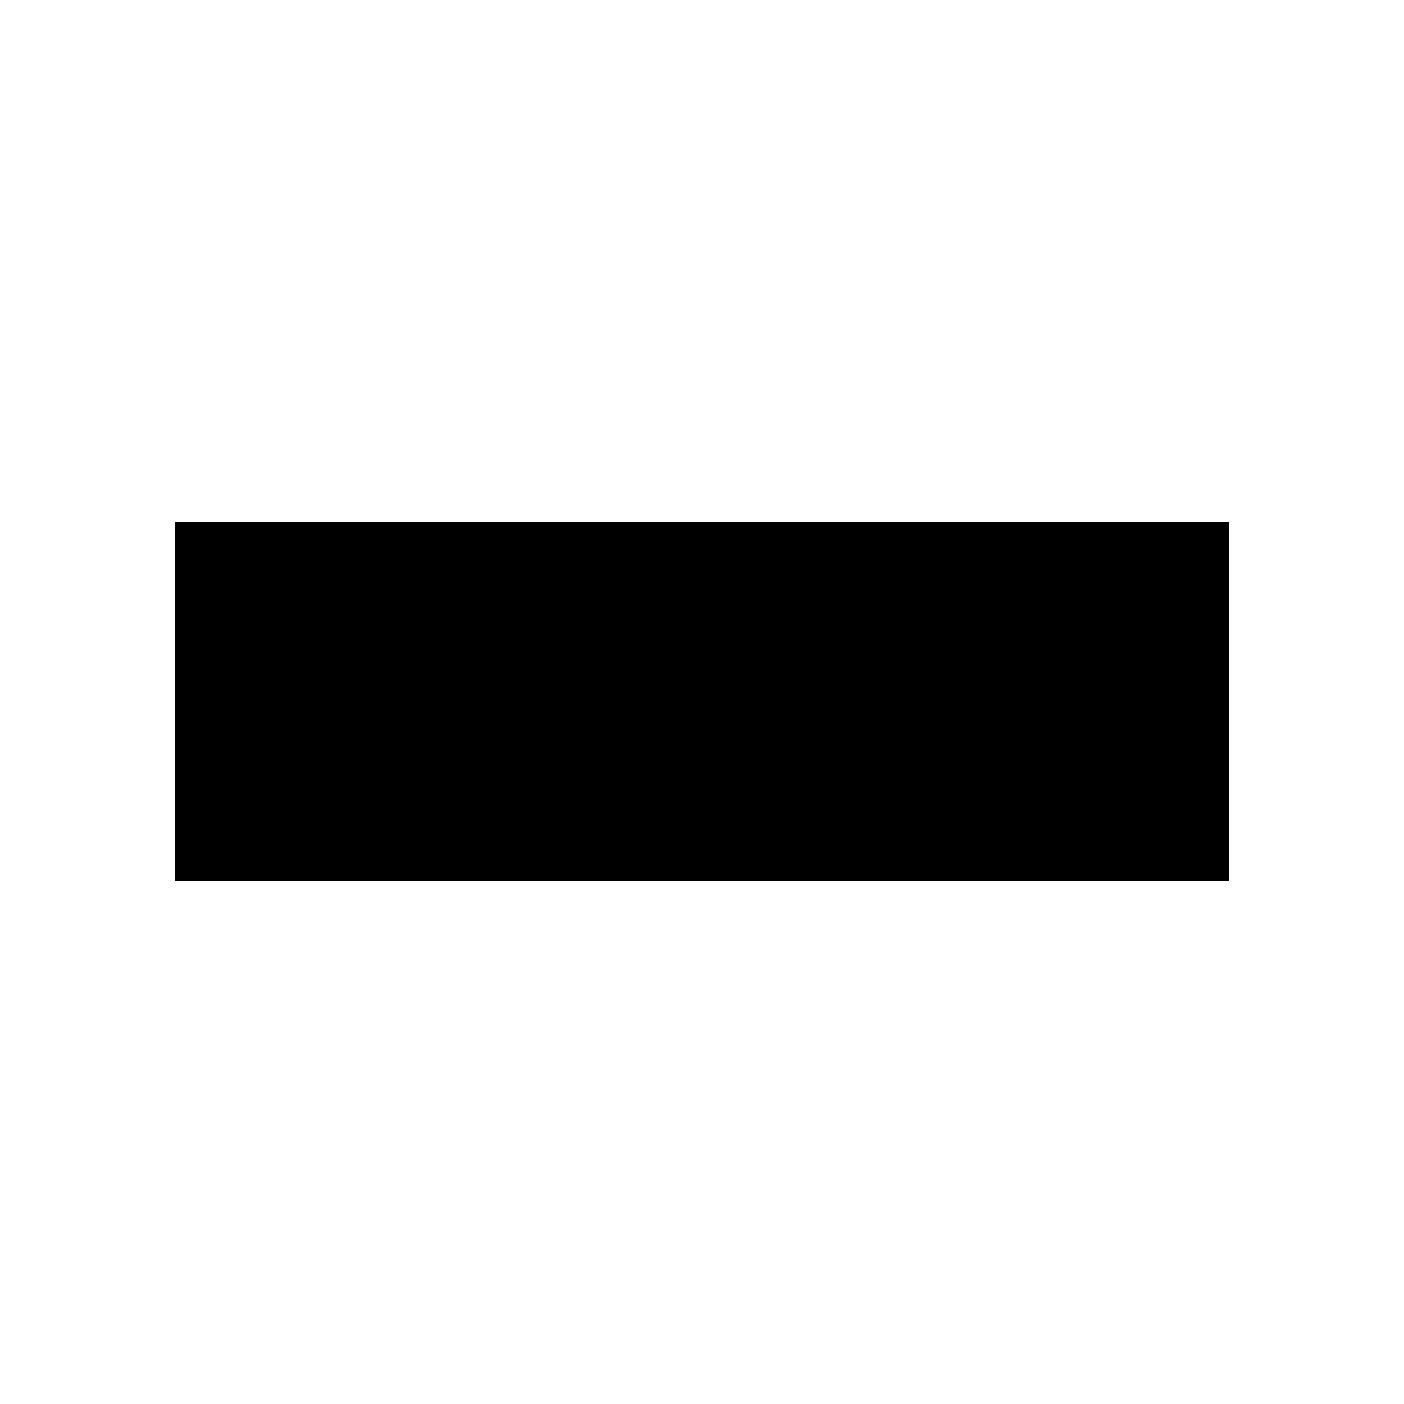 DAFITI - GFG Comércio Digital Ltda